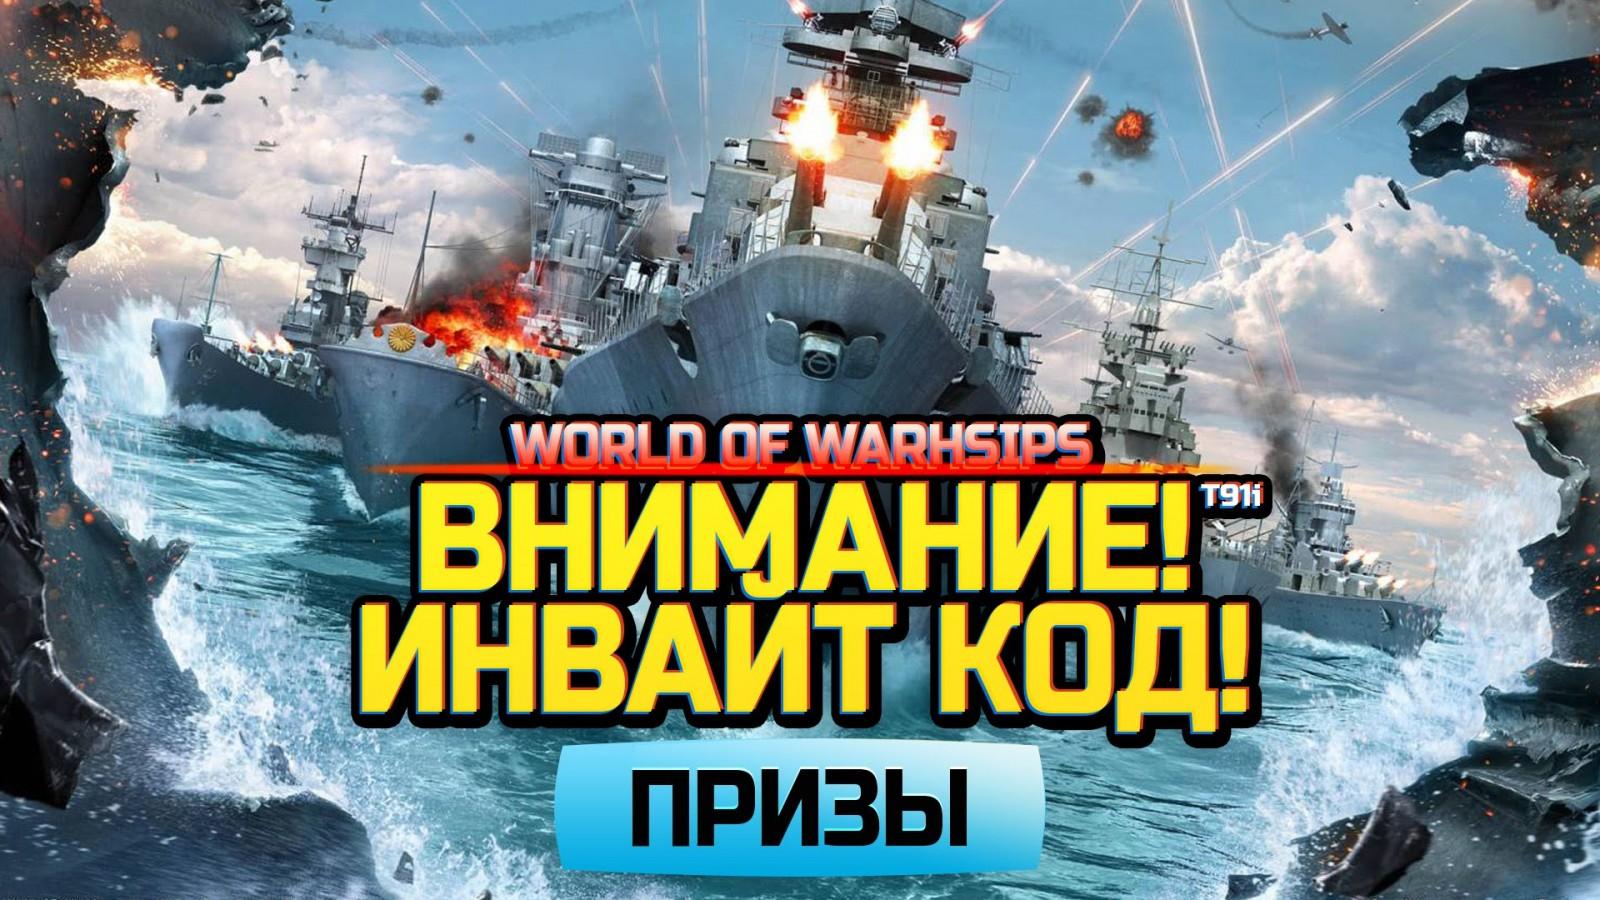 Инвайт код World of Warships 2018: крейсер 5 уровня Marblehead и премиум аккаунт 7 дней